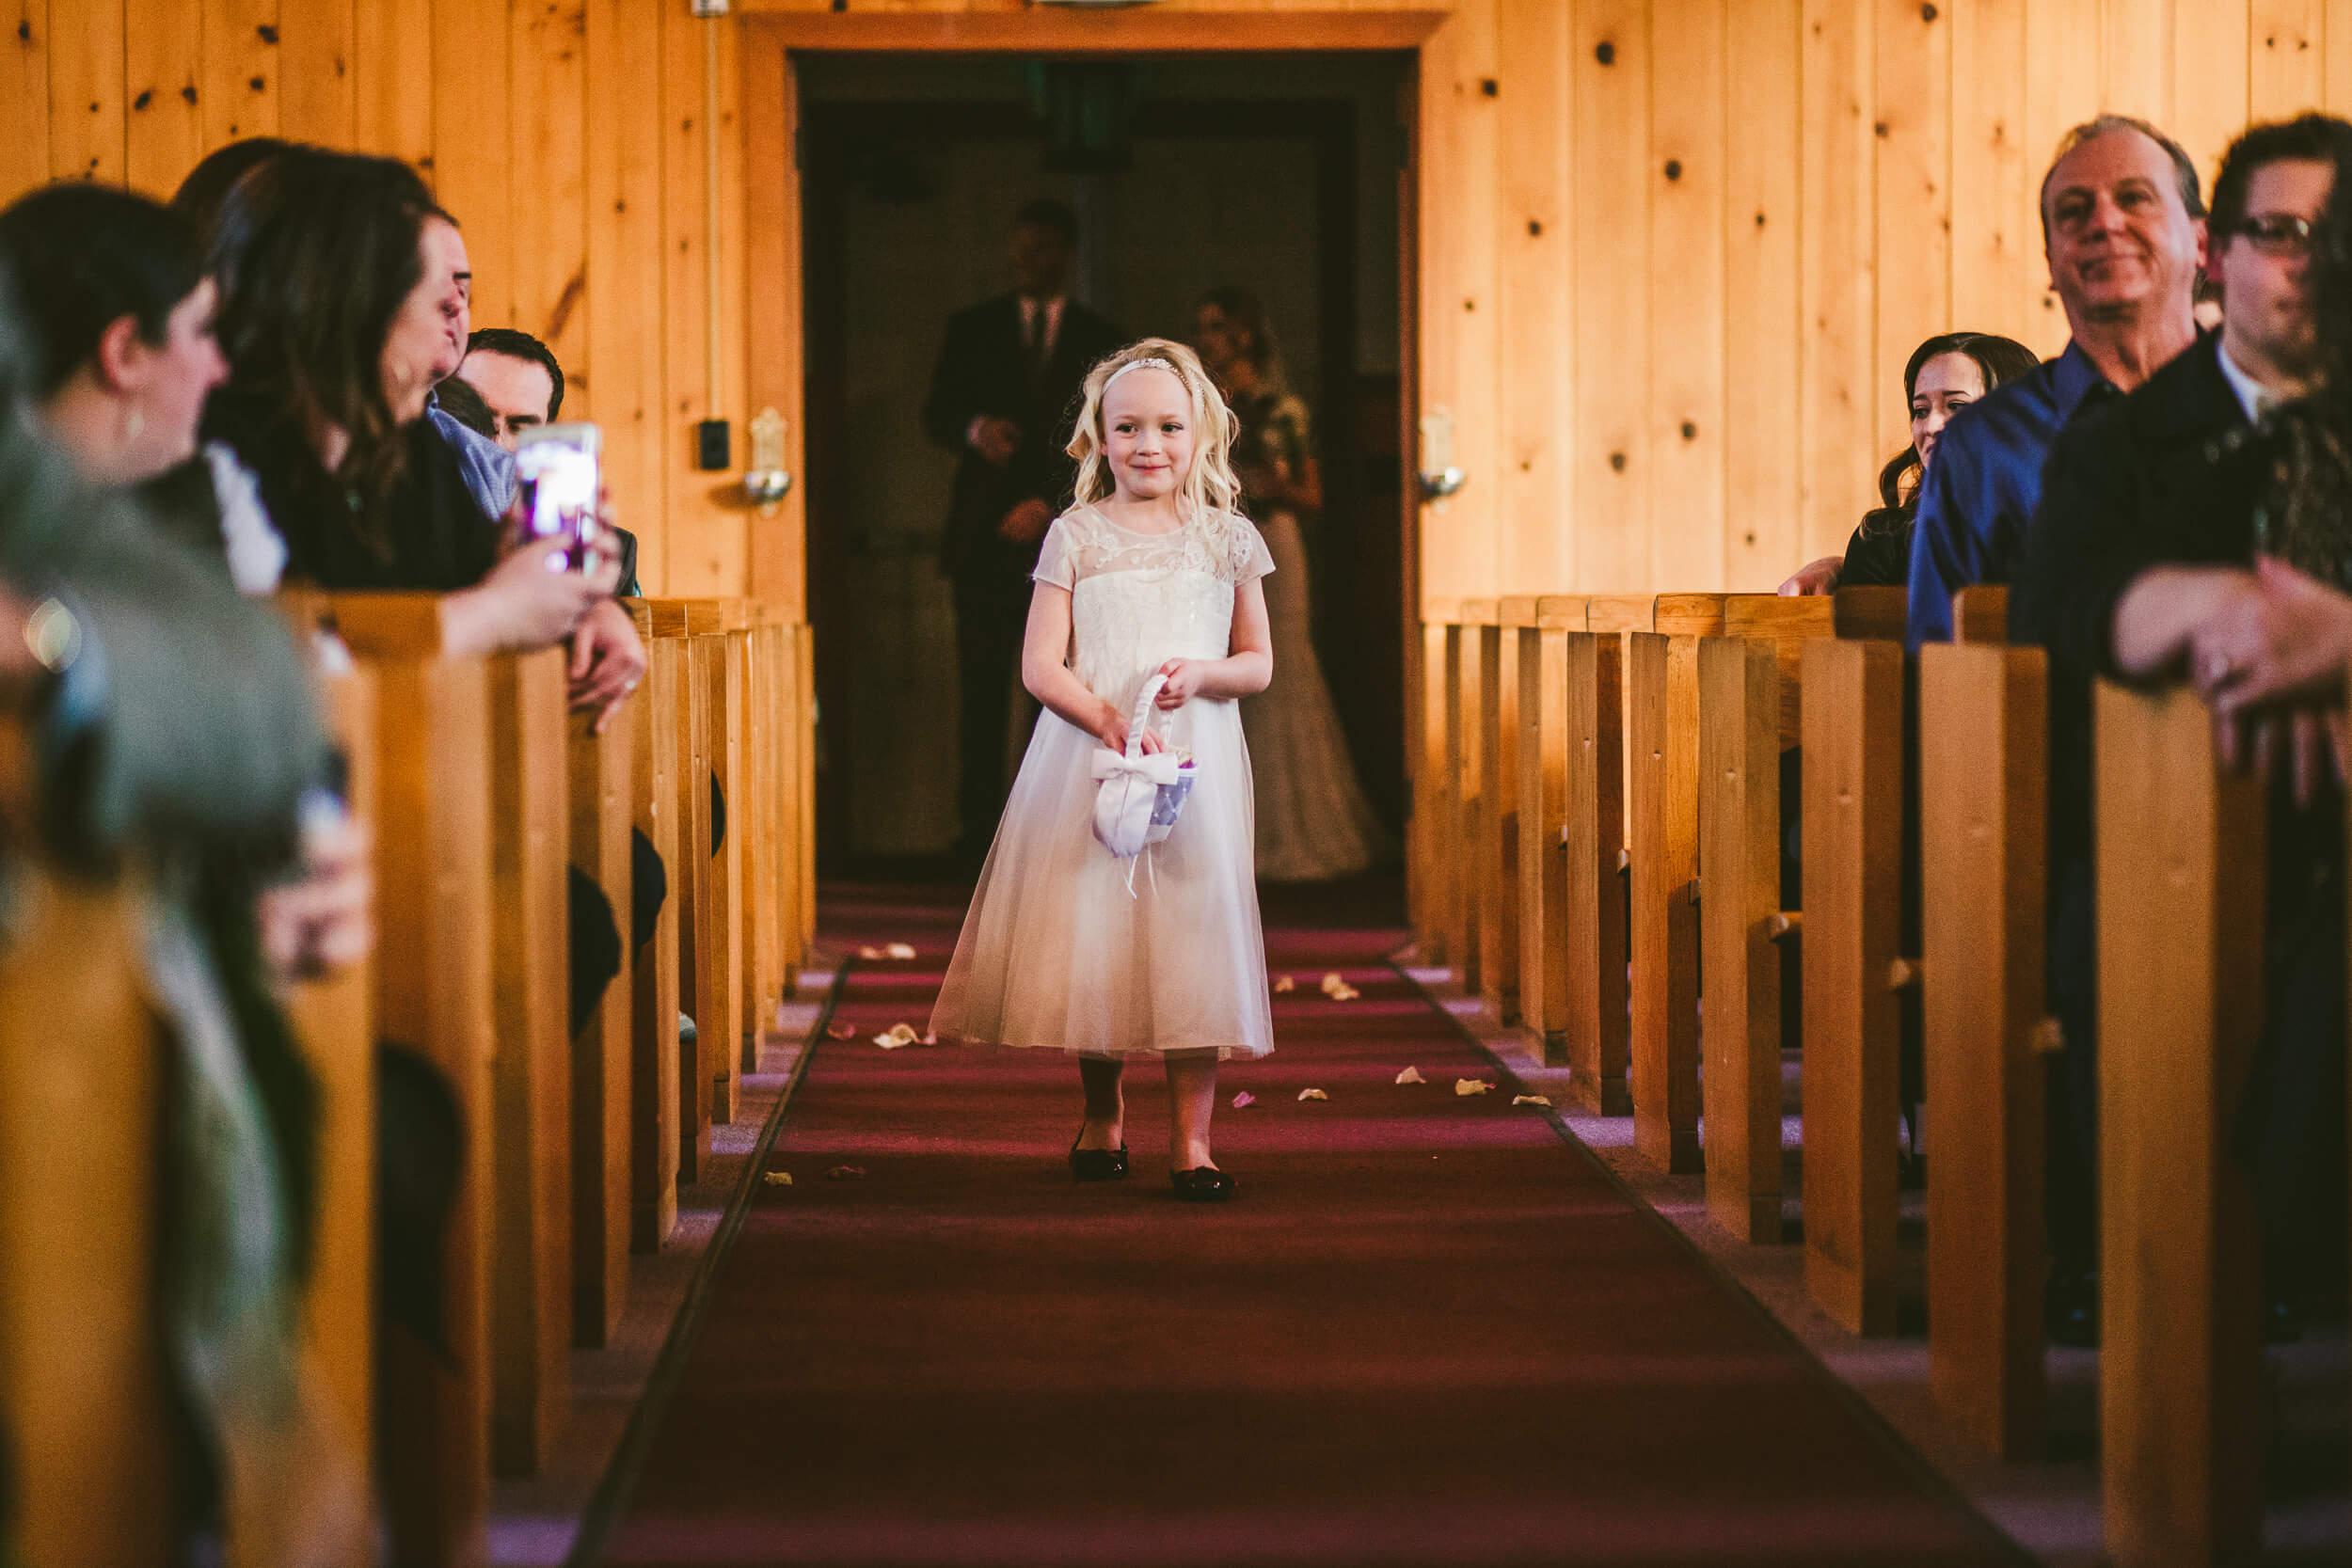 mukogawa winter wedding in spokane (146).jpg